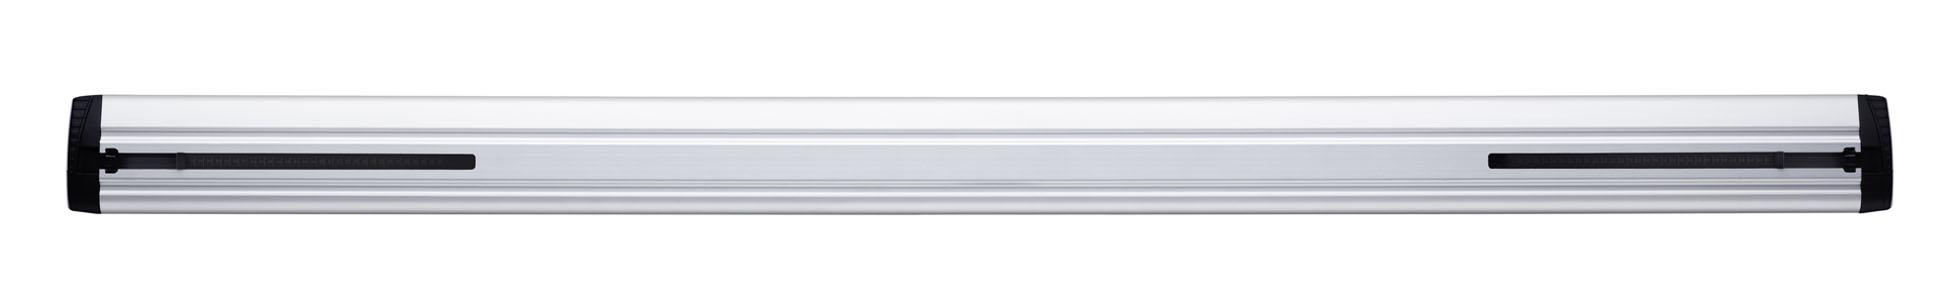 96x100_WingBar_P_underside_white